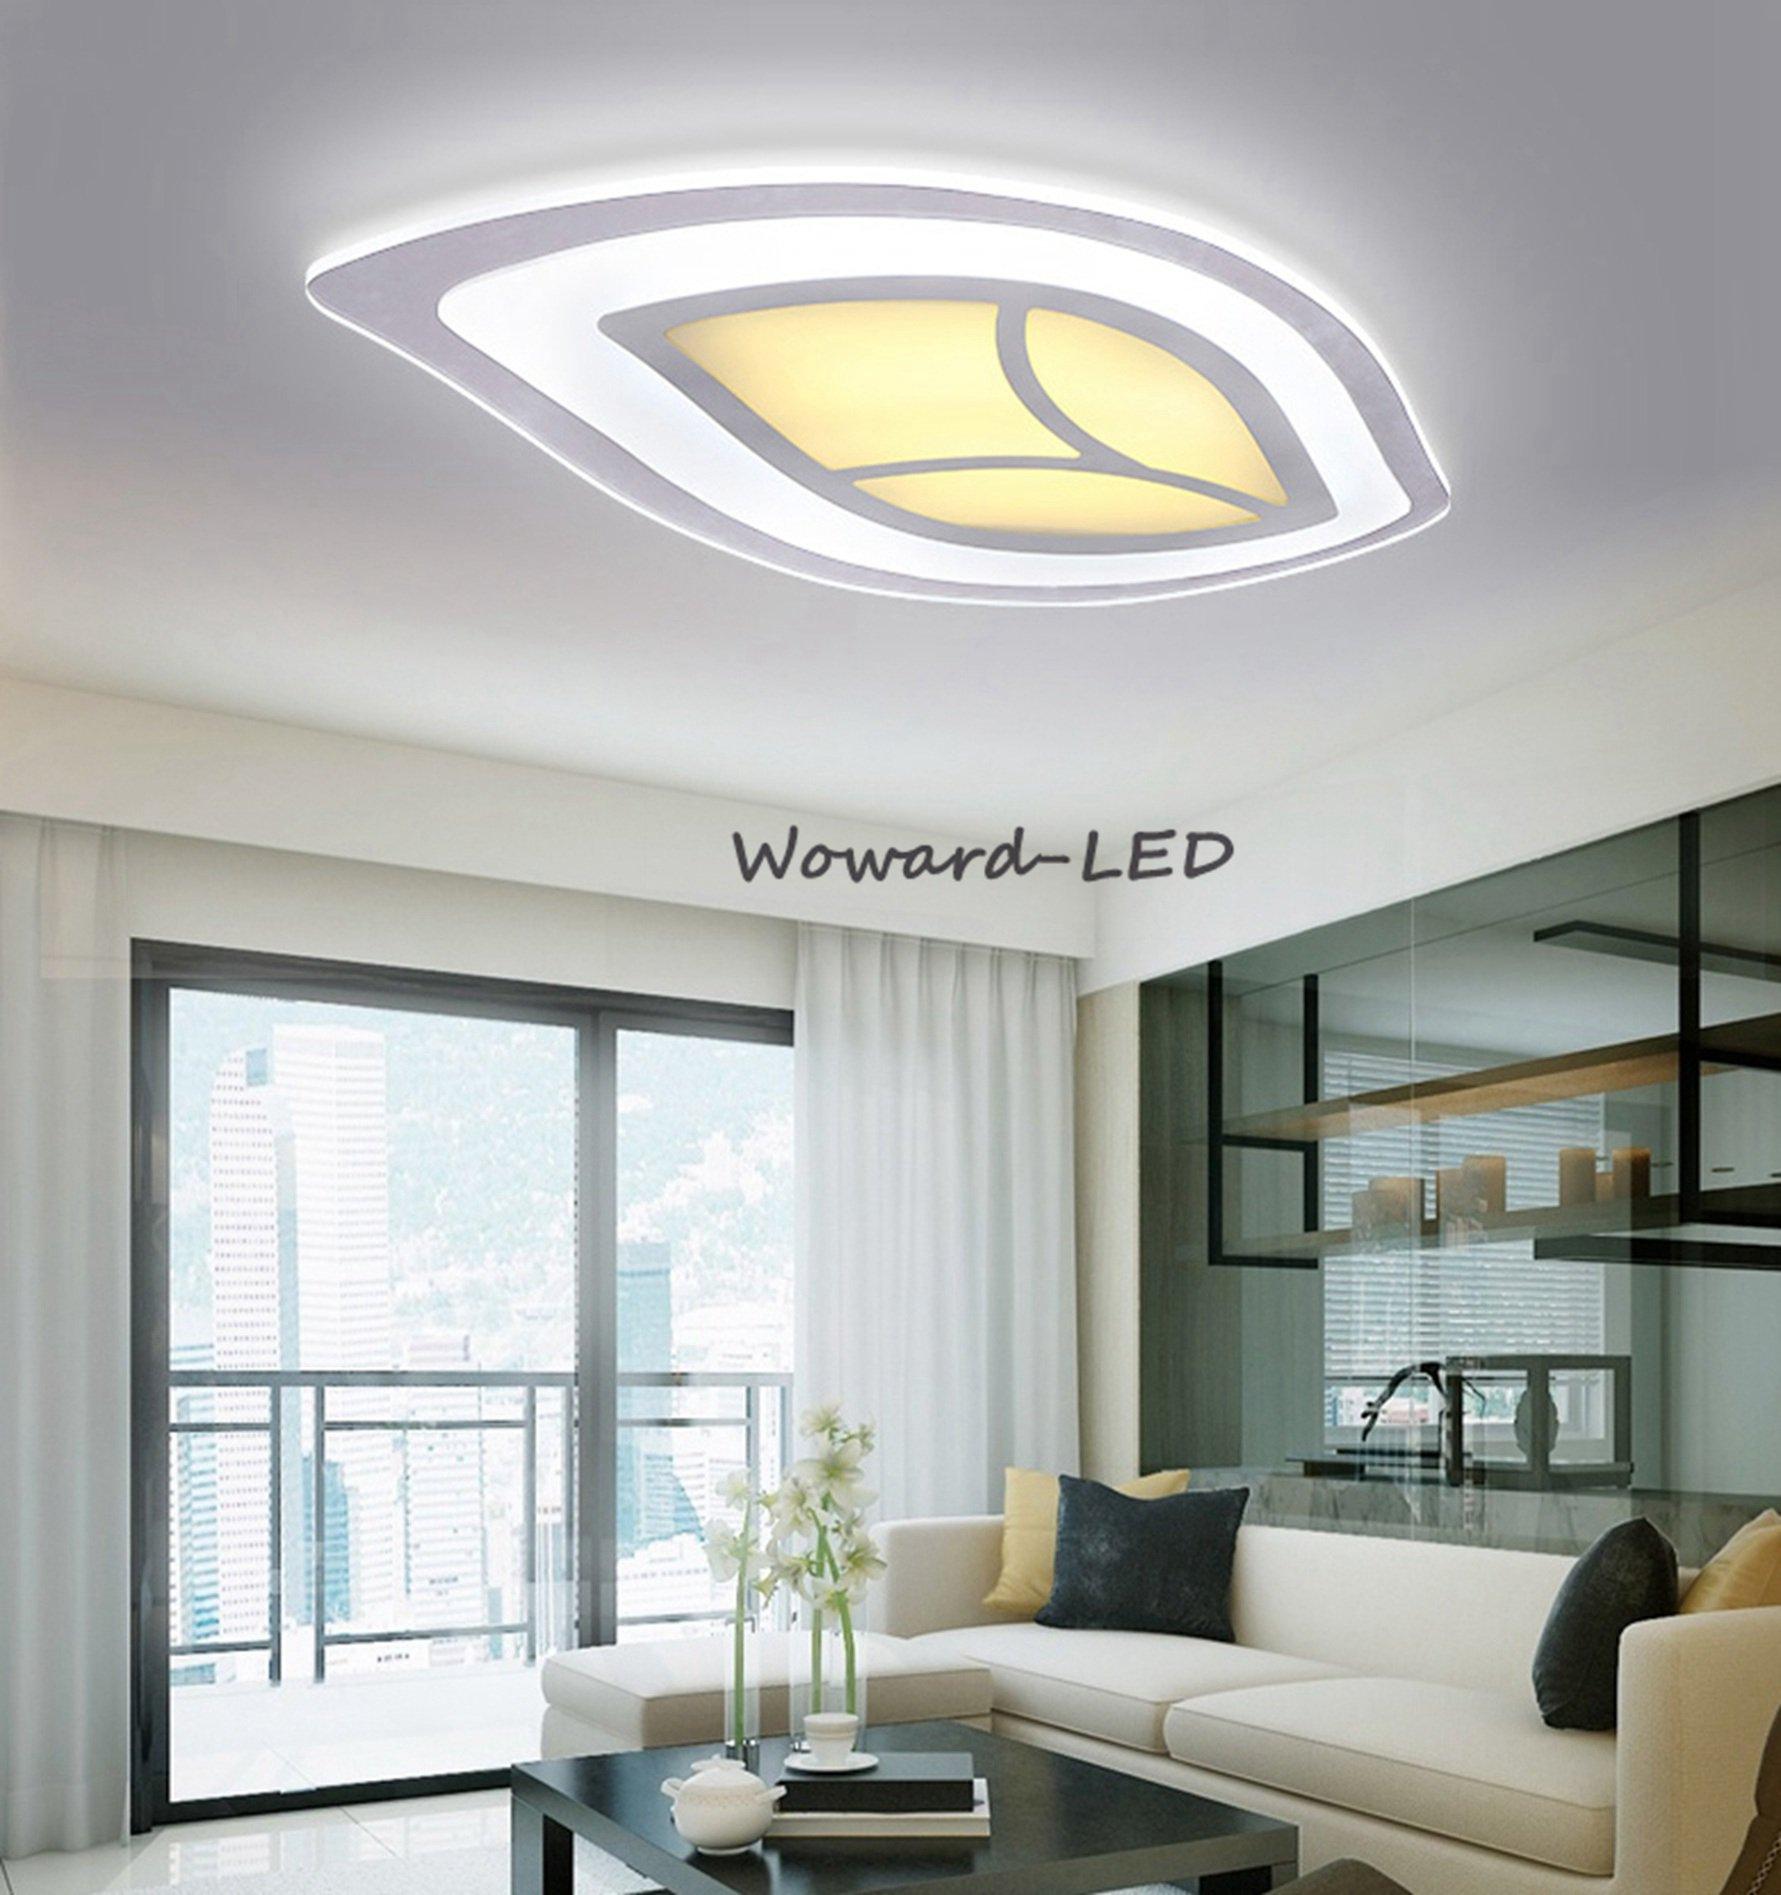 wow bl tter led deckenlampe deckenleuchte 16w bis 100w dimmbar lampe beleuchtung ebay. Black Bedroom Furniture Sets. Home Design Ideas